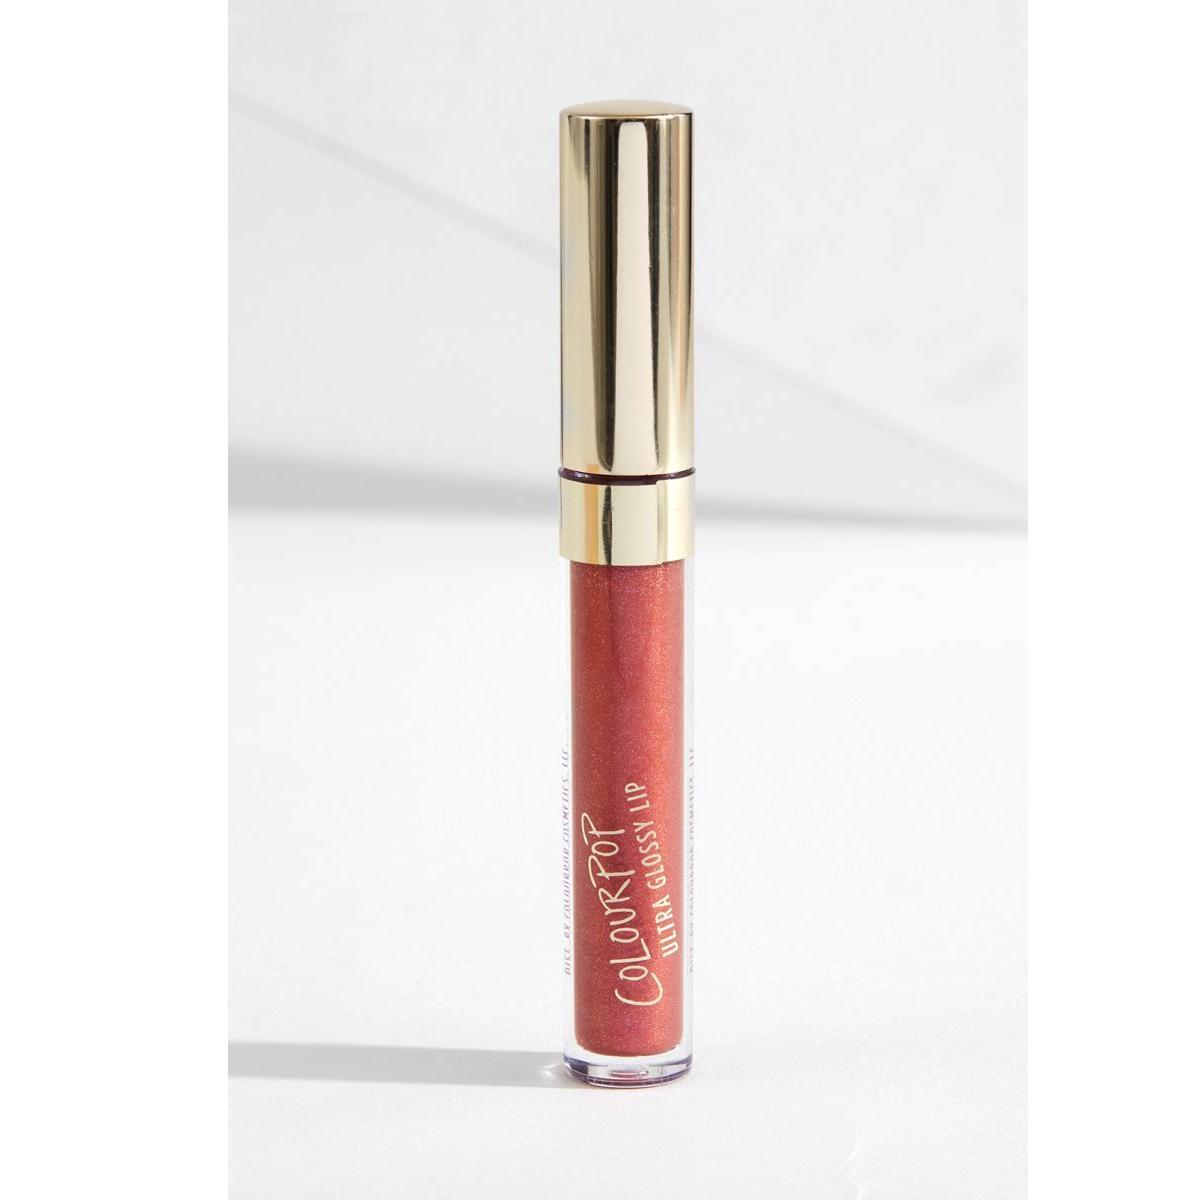 Colourpop Ultra Glossy Lip Fairy Me